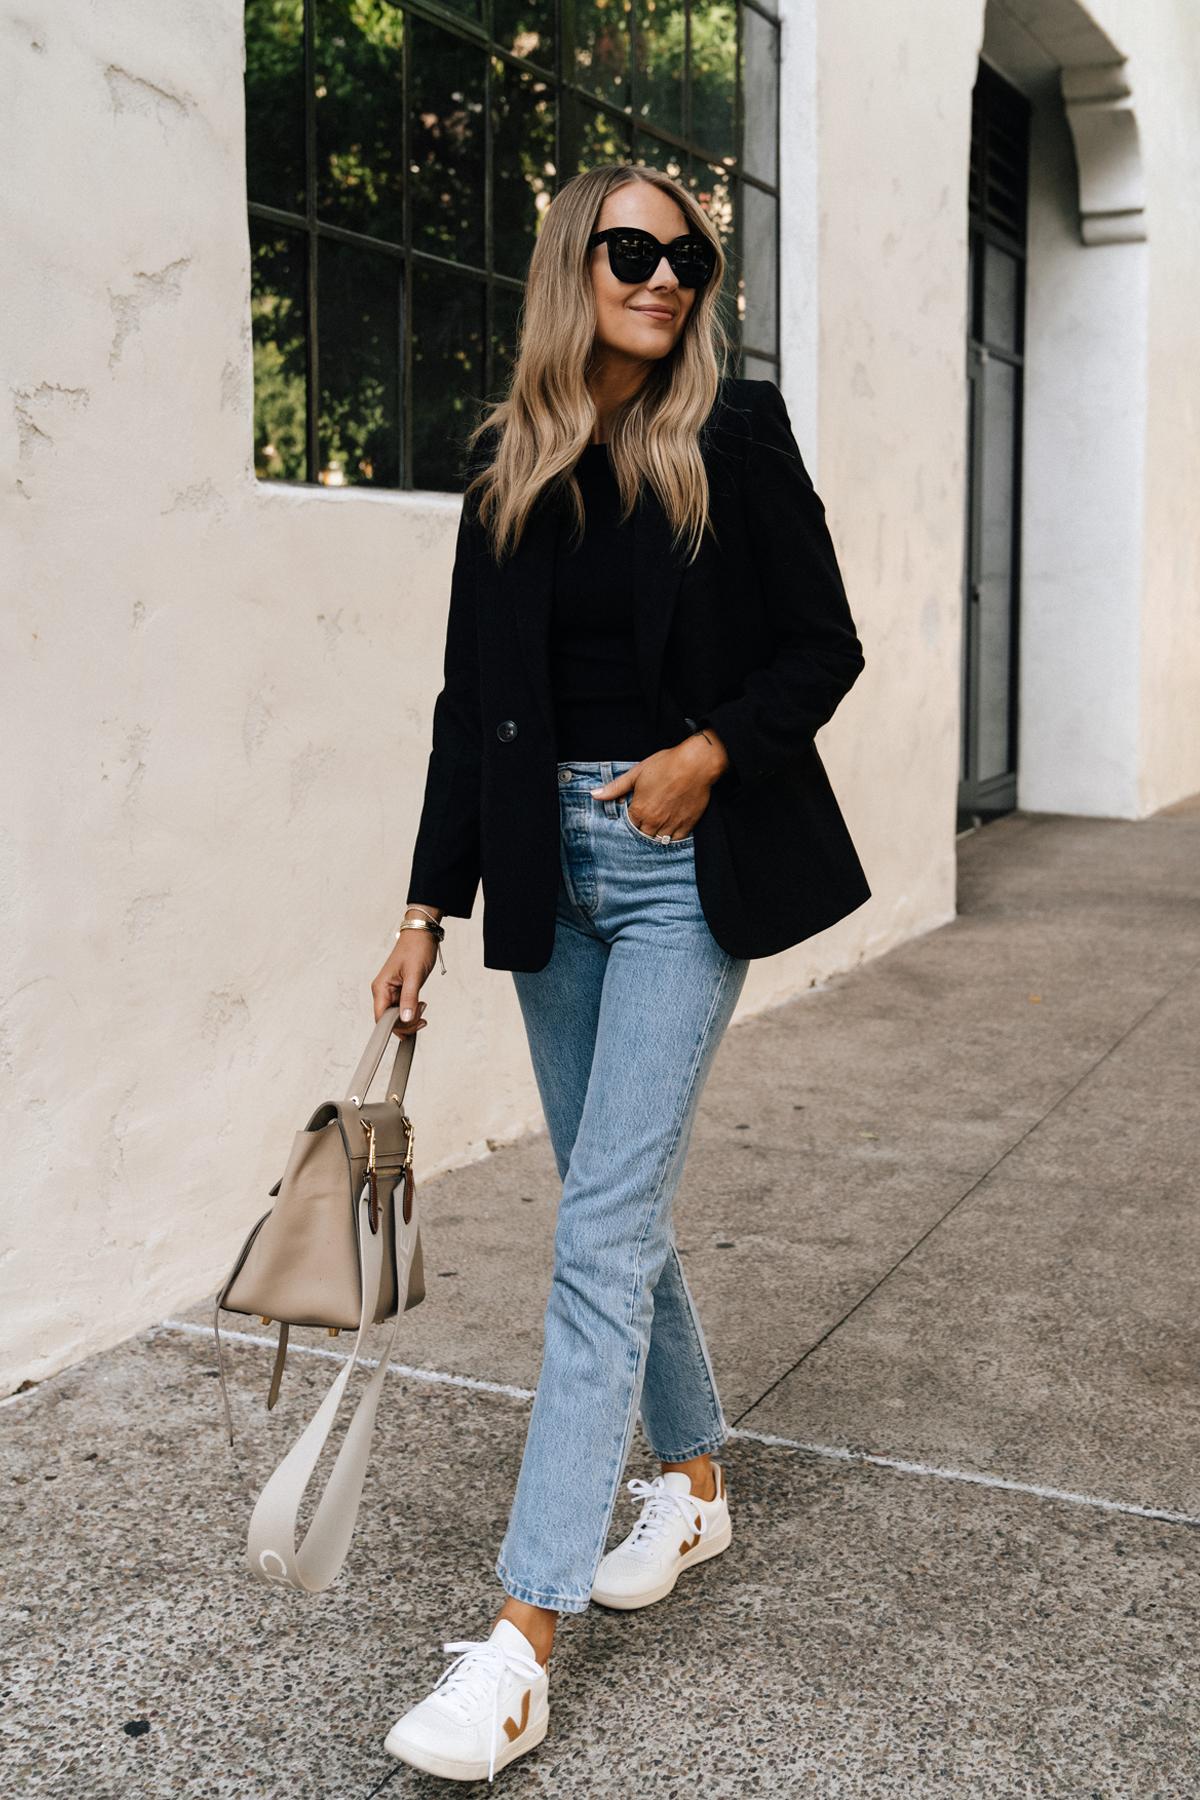 Fashion Jackson Wearing Anine Bing Black Blazer Levis Straight Leg jeans Veja V10 Camel White Sneakers Celine Mini Belt Bag Taupe Fall Outfit Street Style